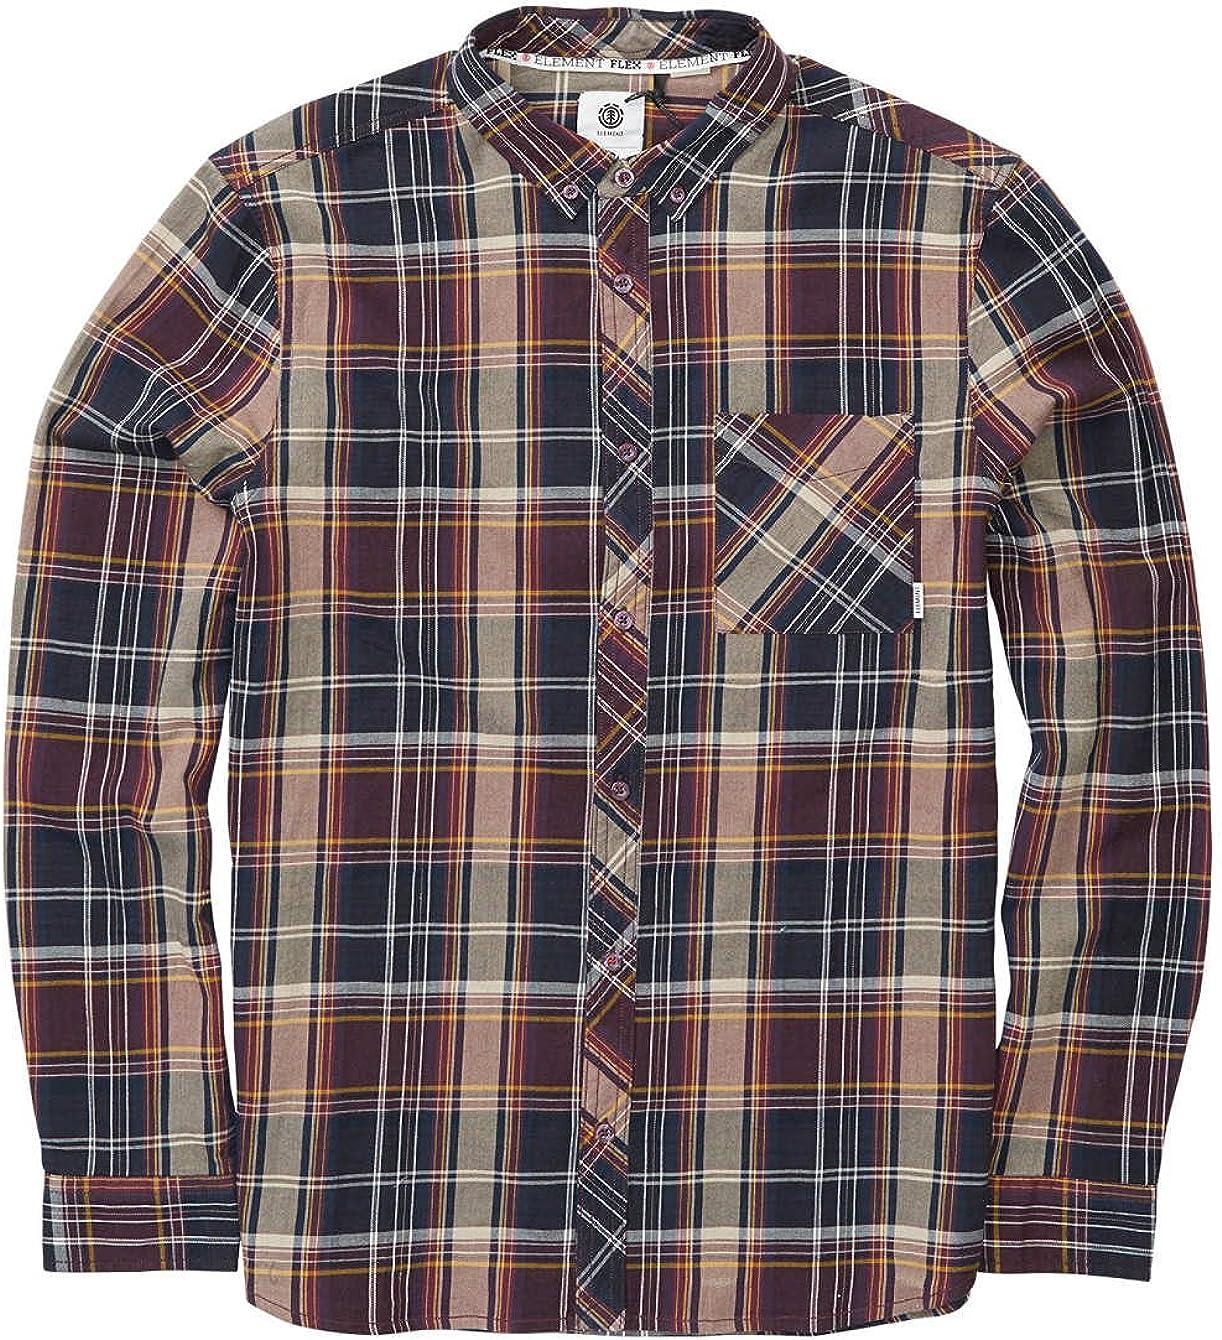 Element Buffalo - Camisa larga para hombre: Amazon.es: Ropa